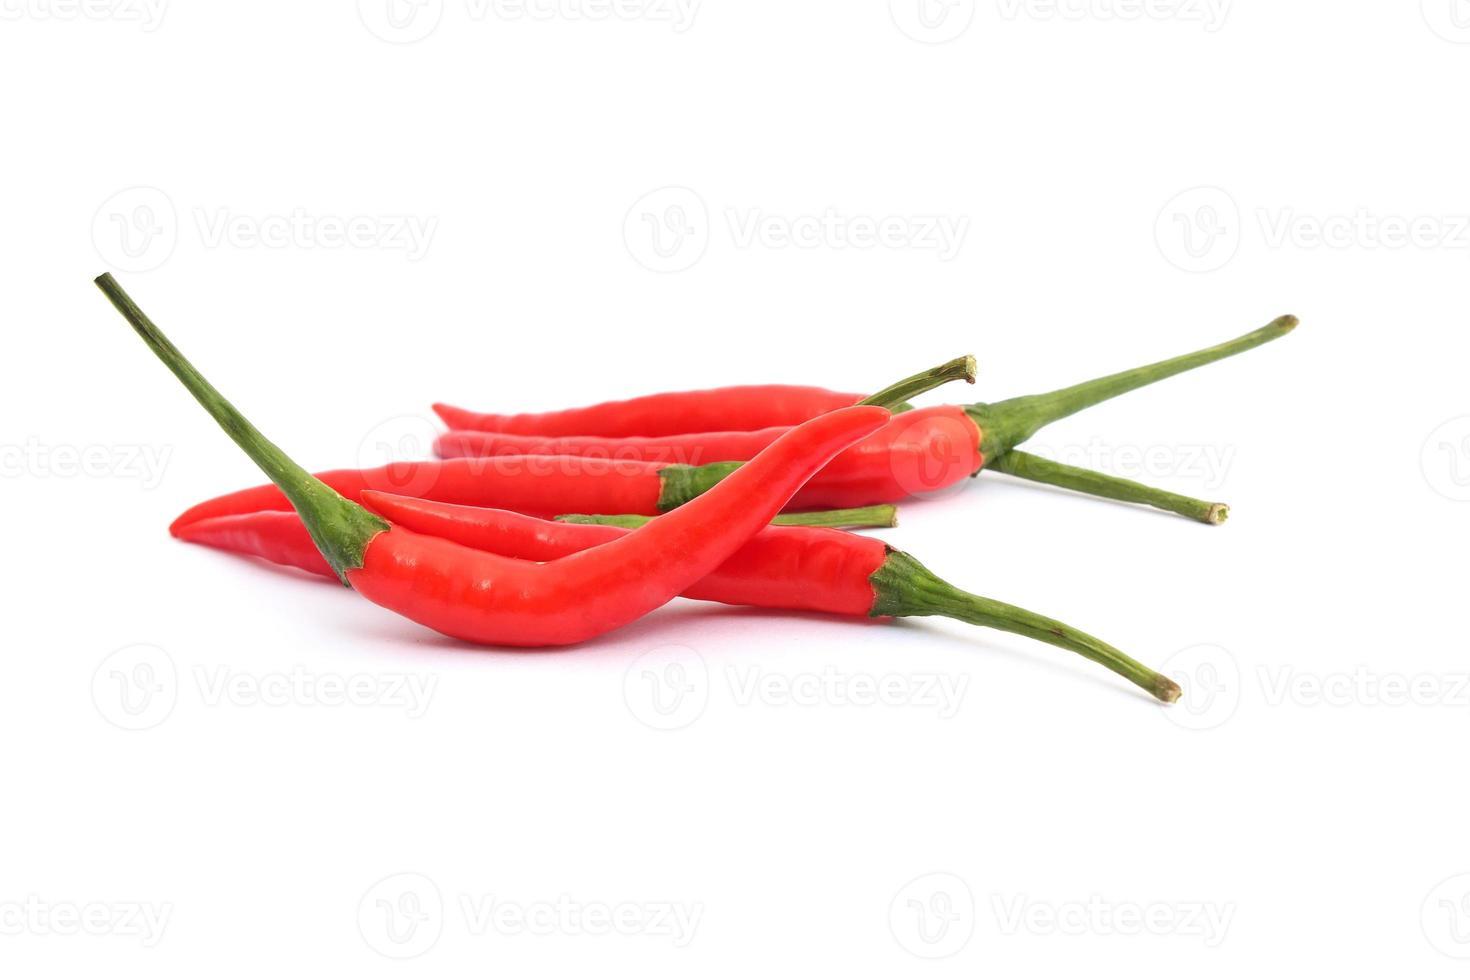 röd chilipeppar på vit bakgrund foto